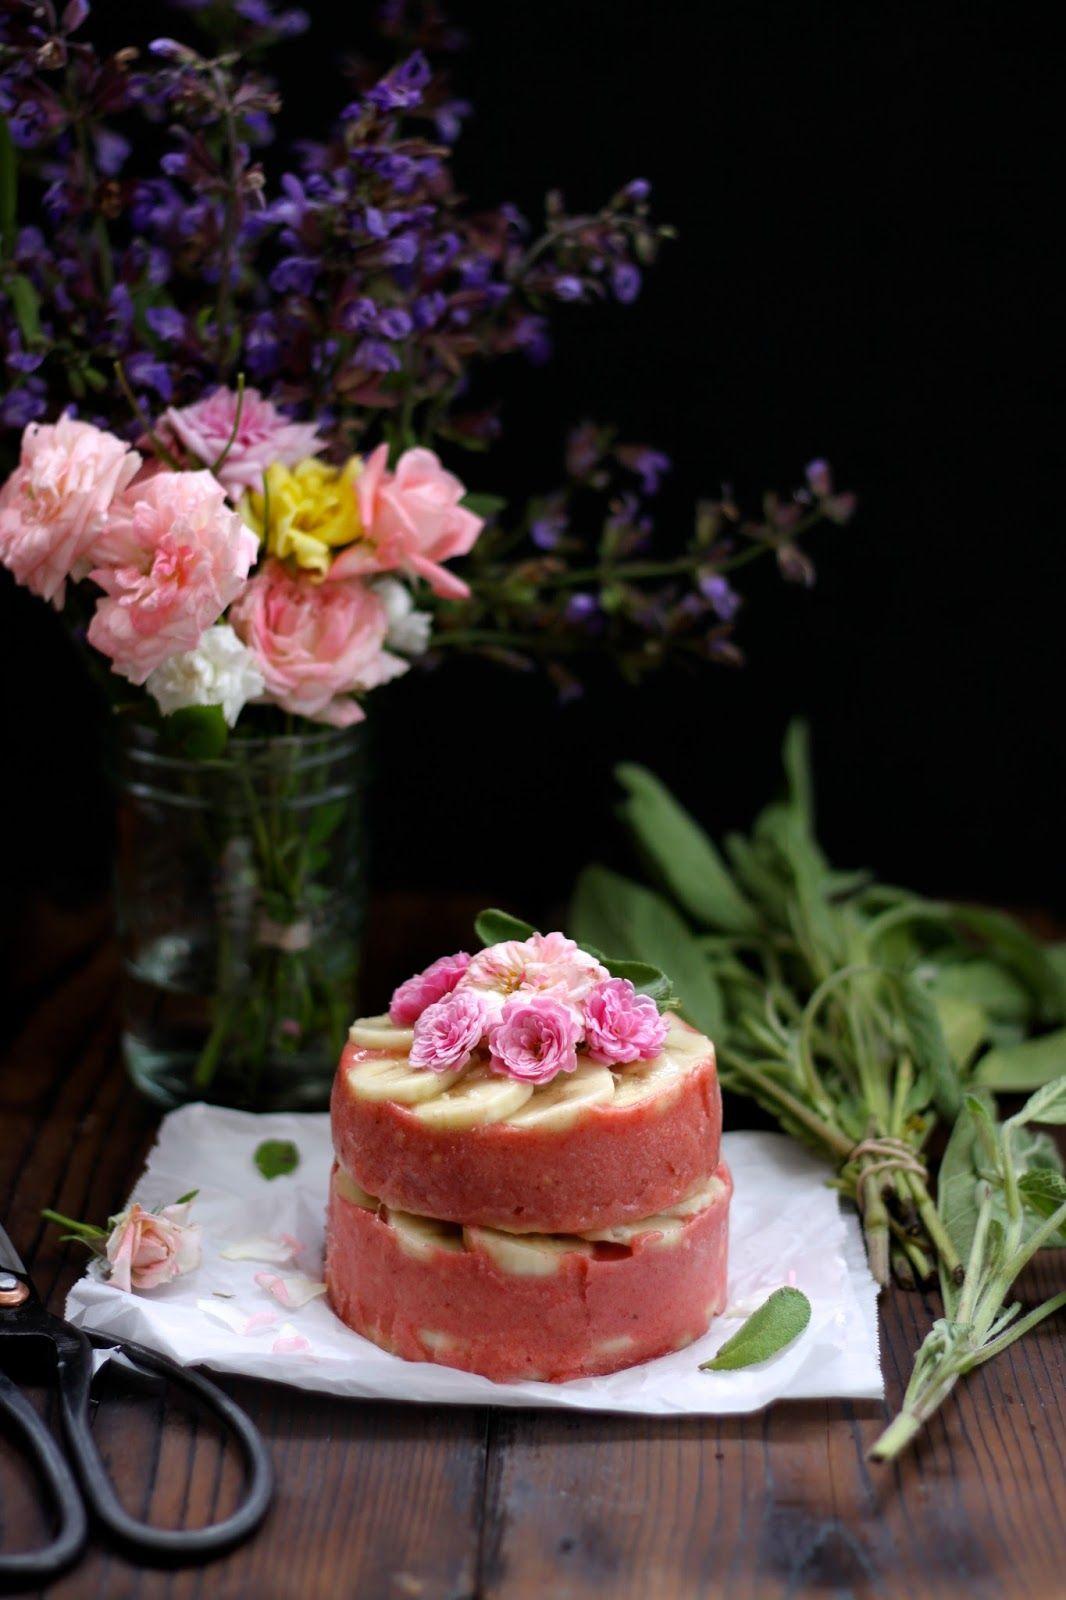 banana split cake RAW. | Desserts, Ice cream cake, Dessert